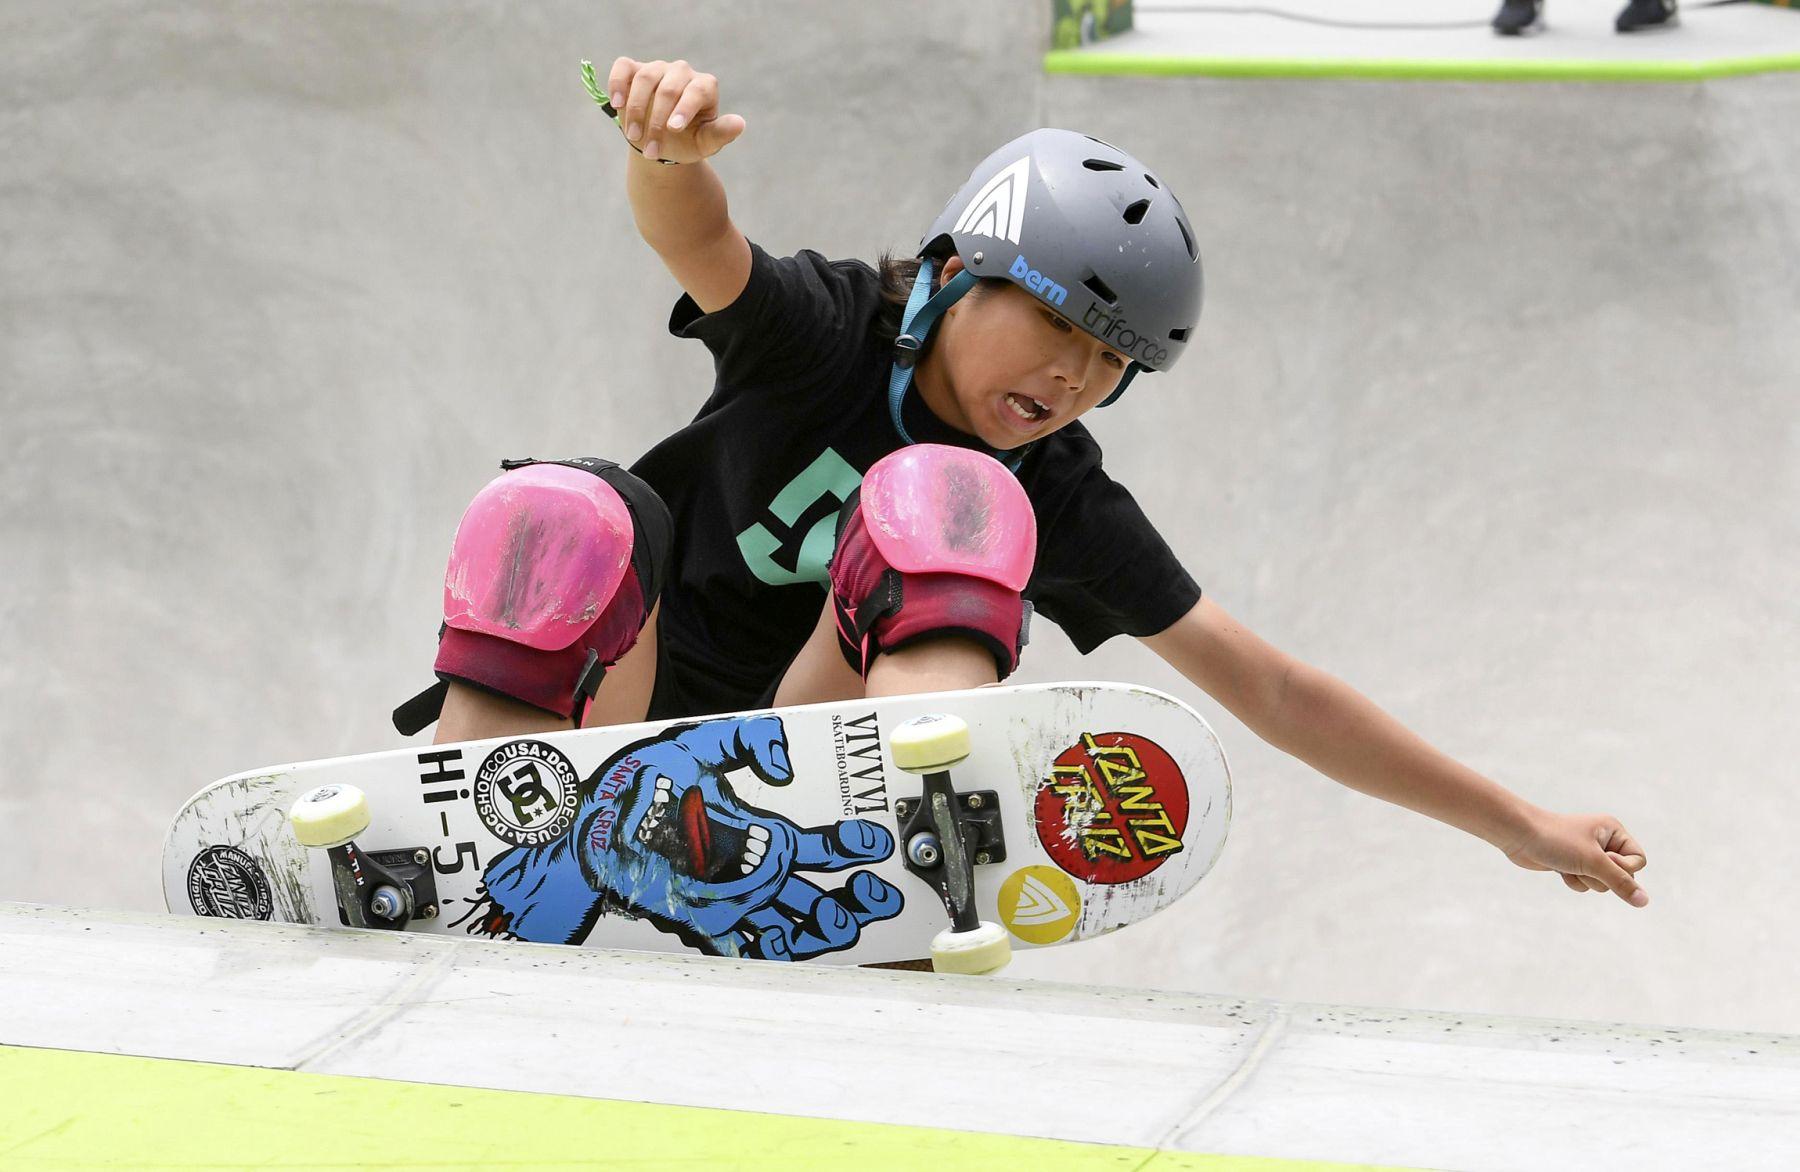 Misugu Okamoto Japan Wins in the Womens Park Skateboard Final 003